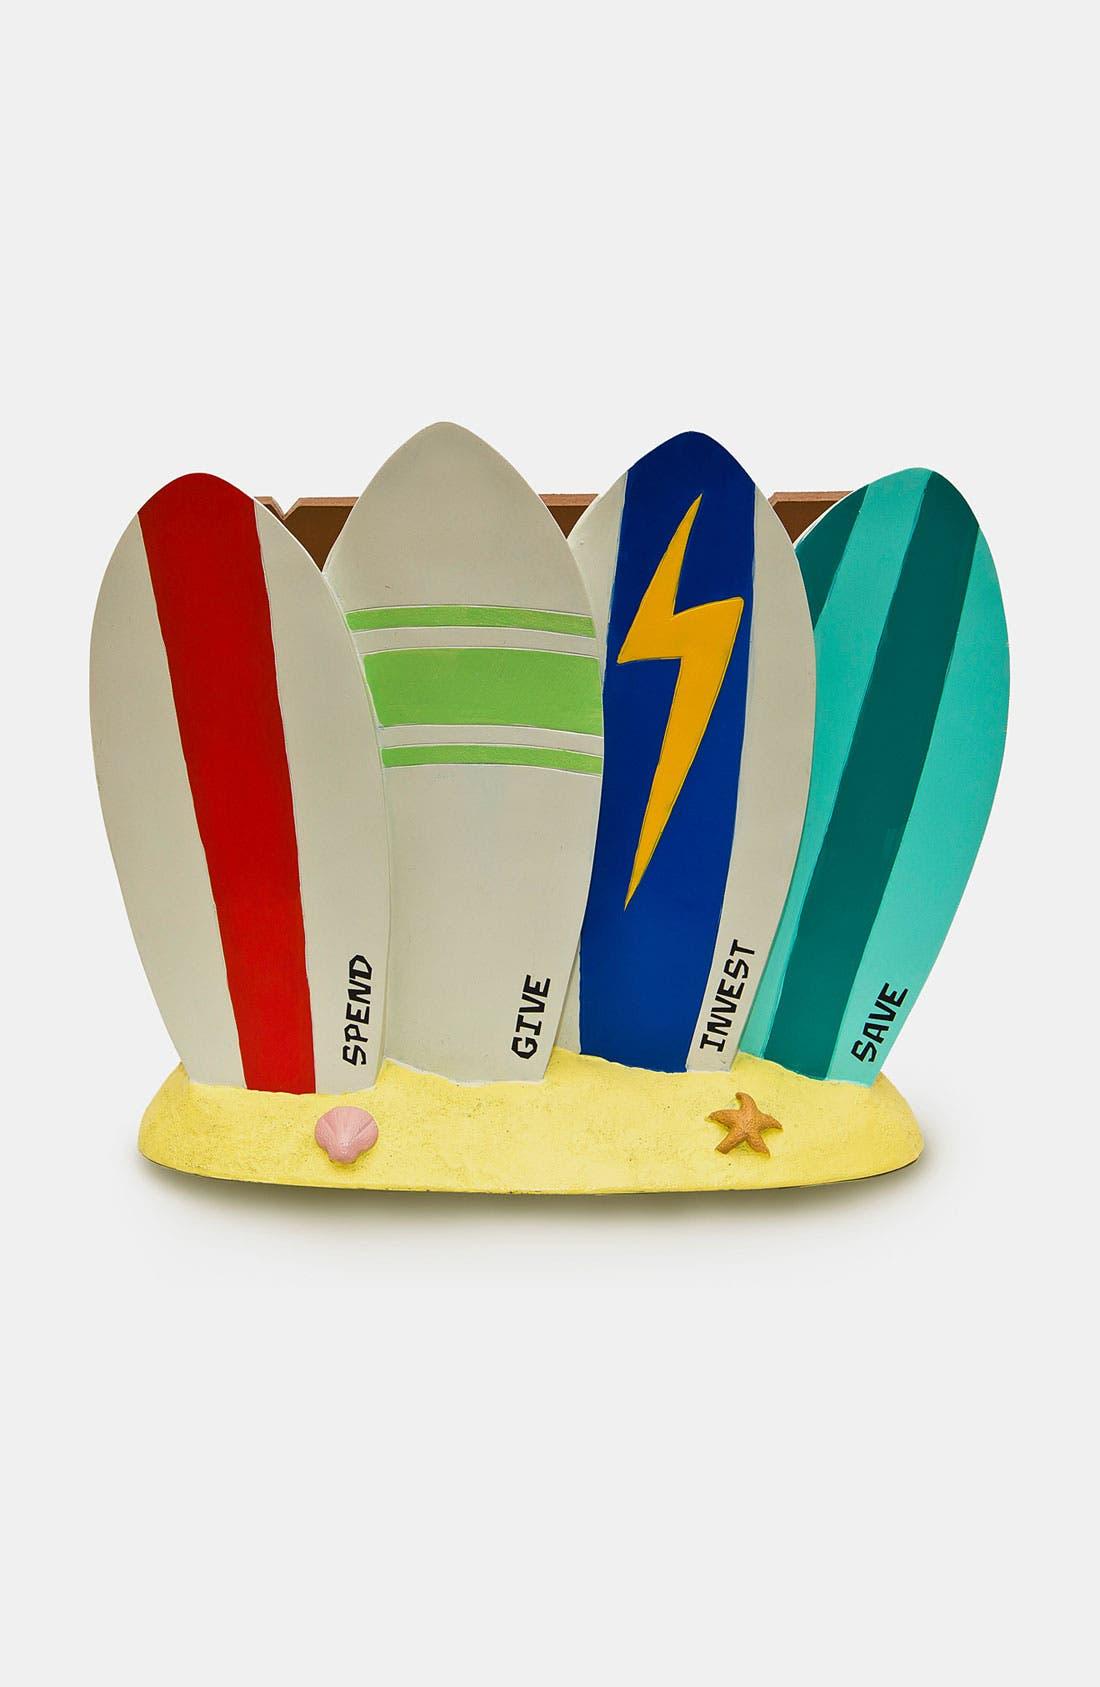 Alternate Image 1 Selected - Money Scholar Surf Savings Bank